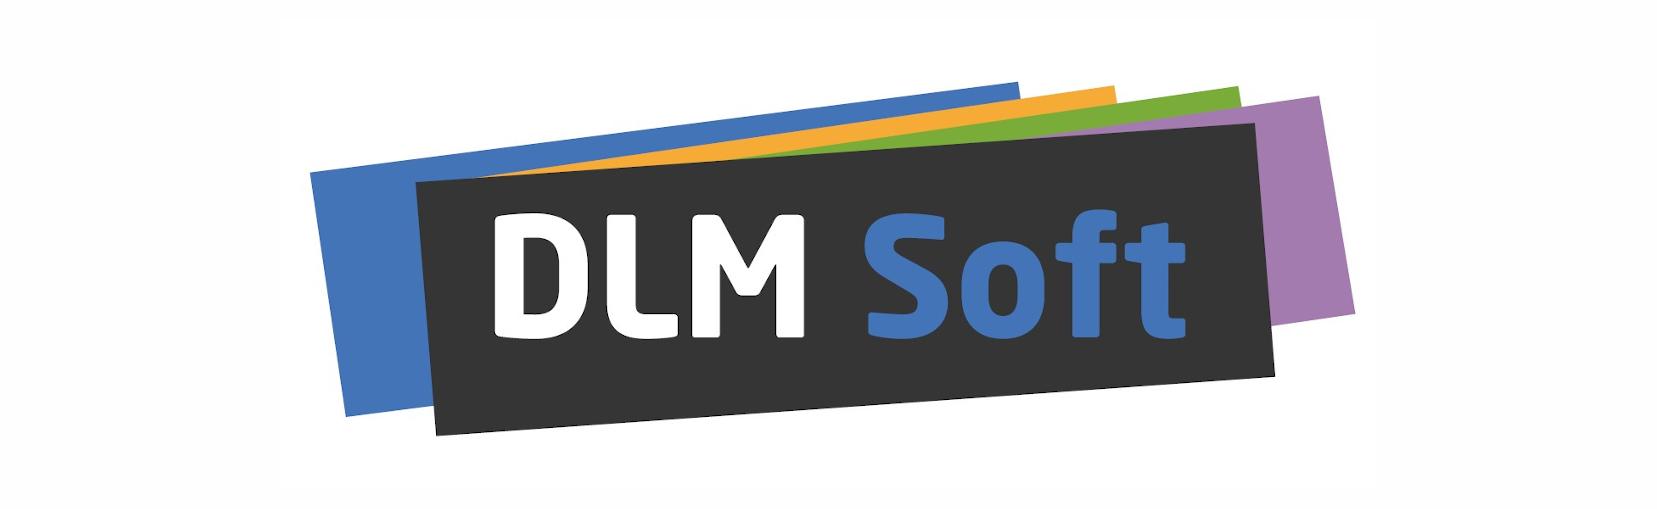 DLM Soft